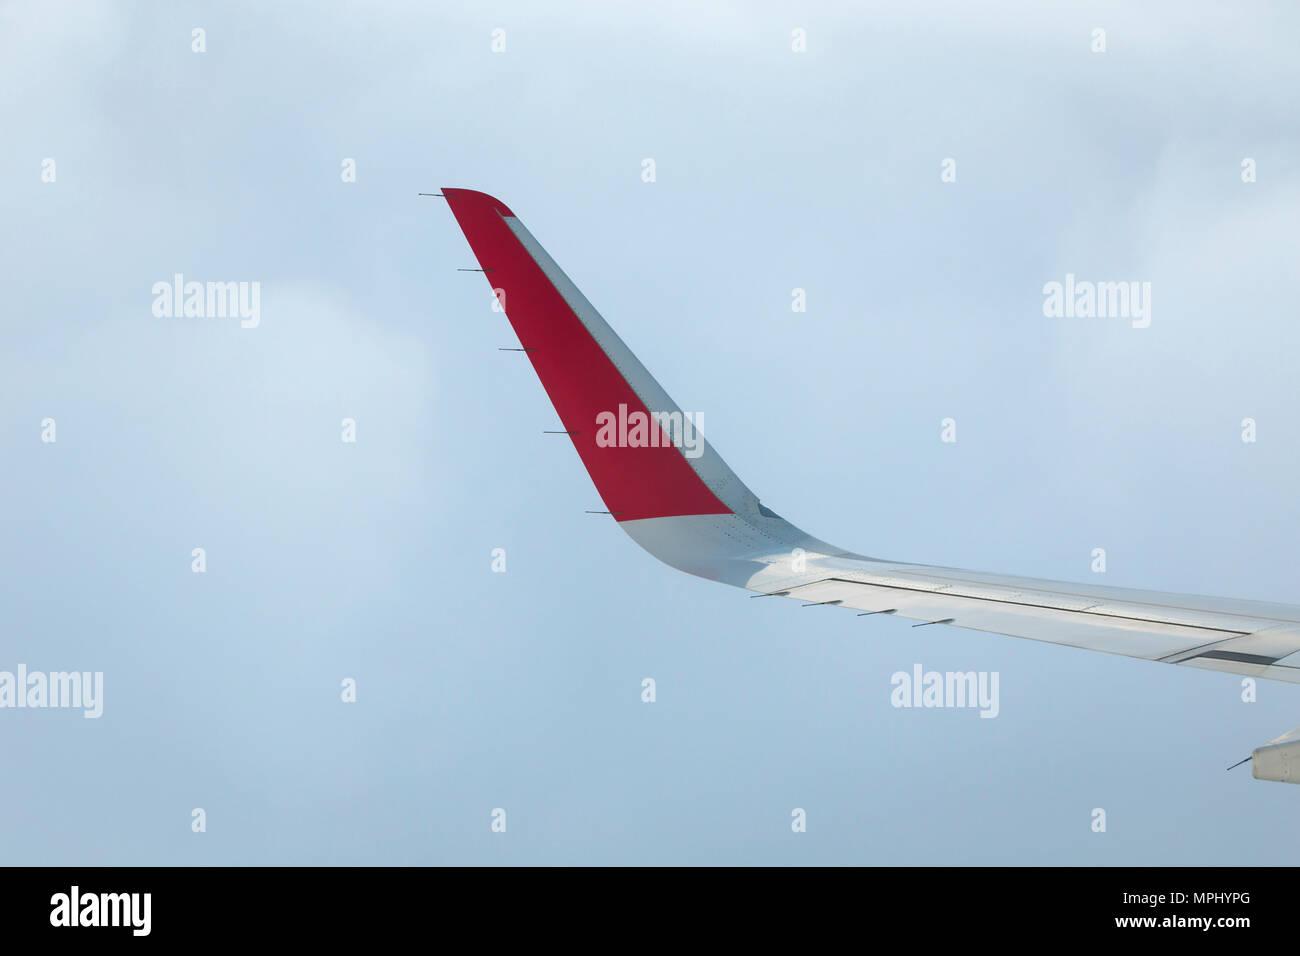 Airasia winglet, Indonesia - Stock Image